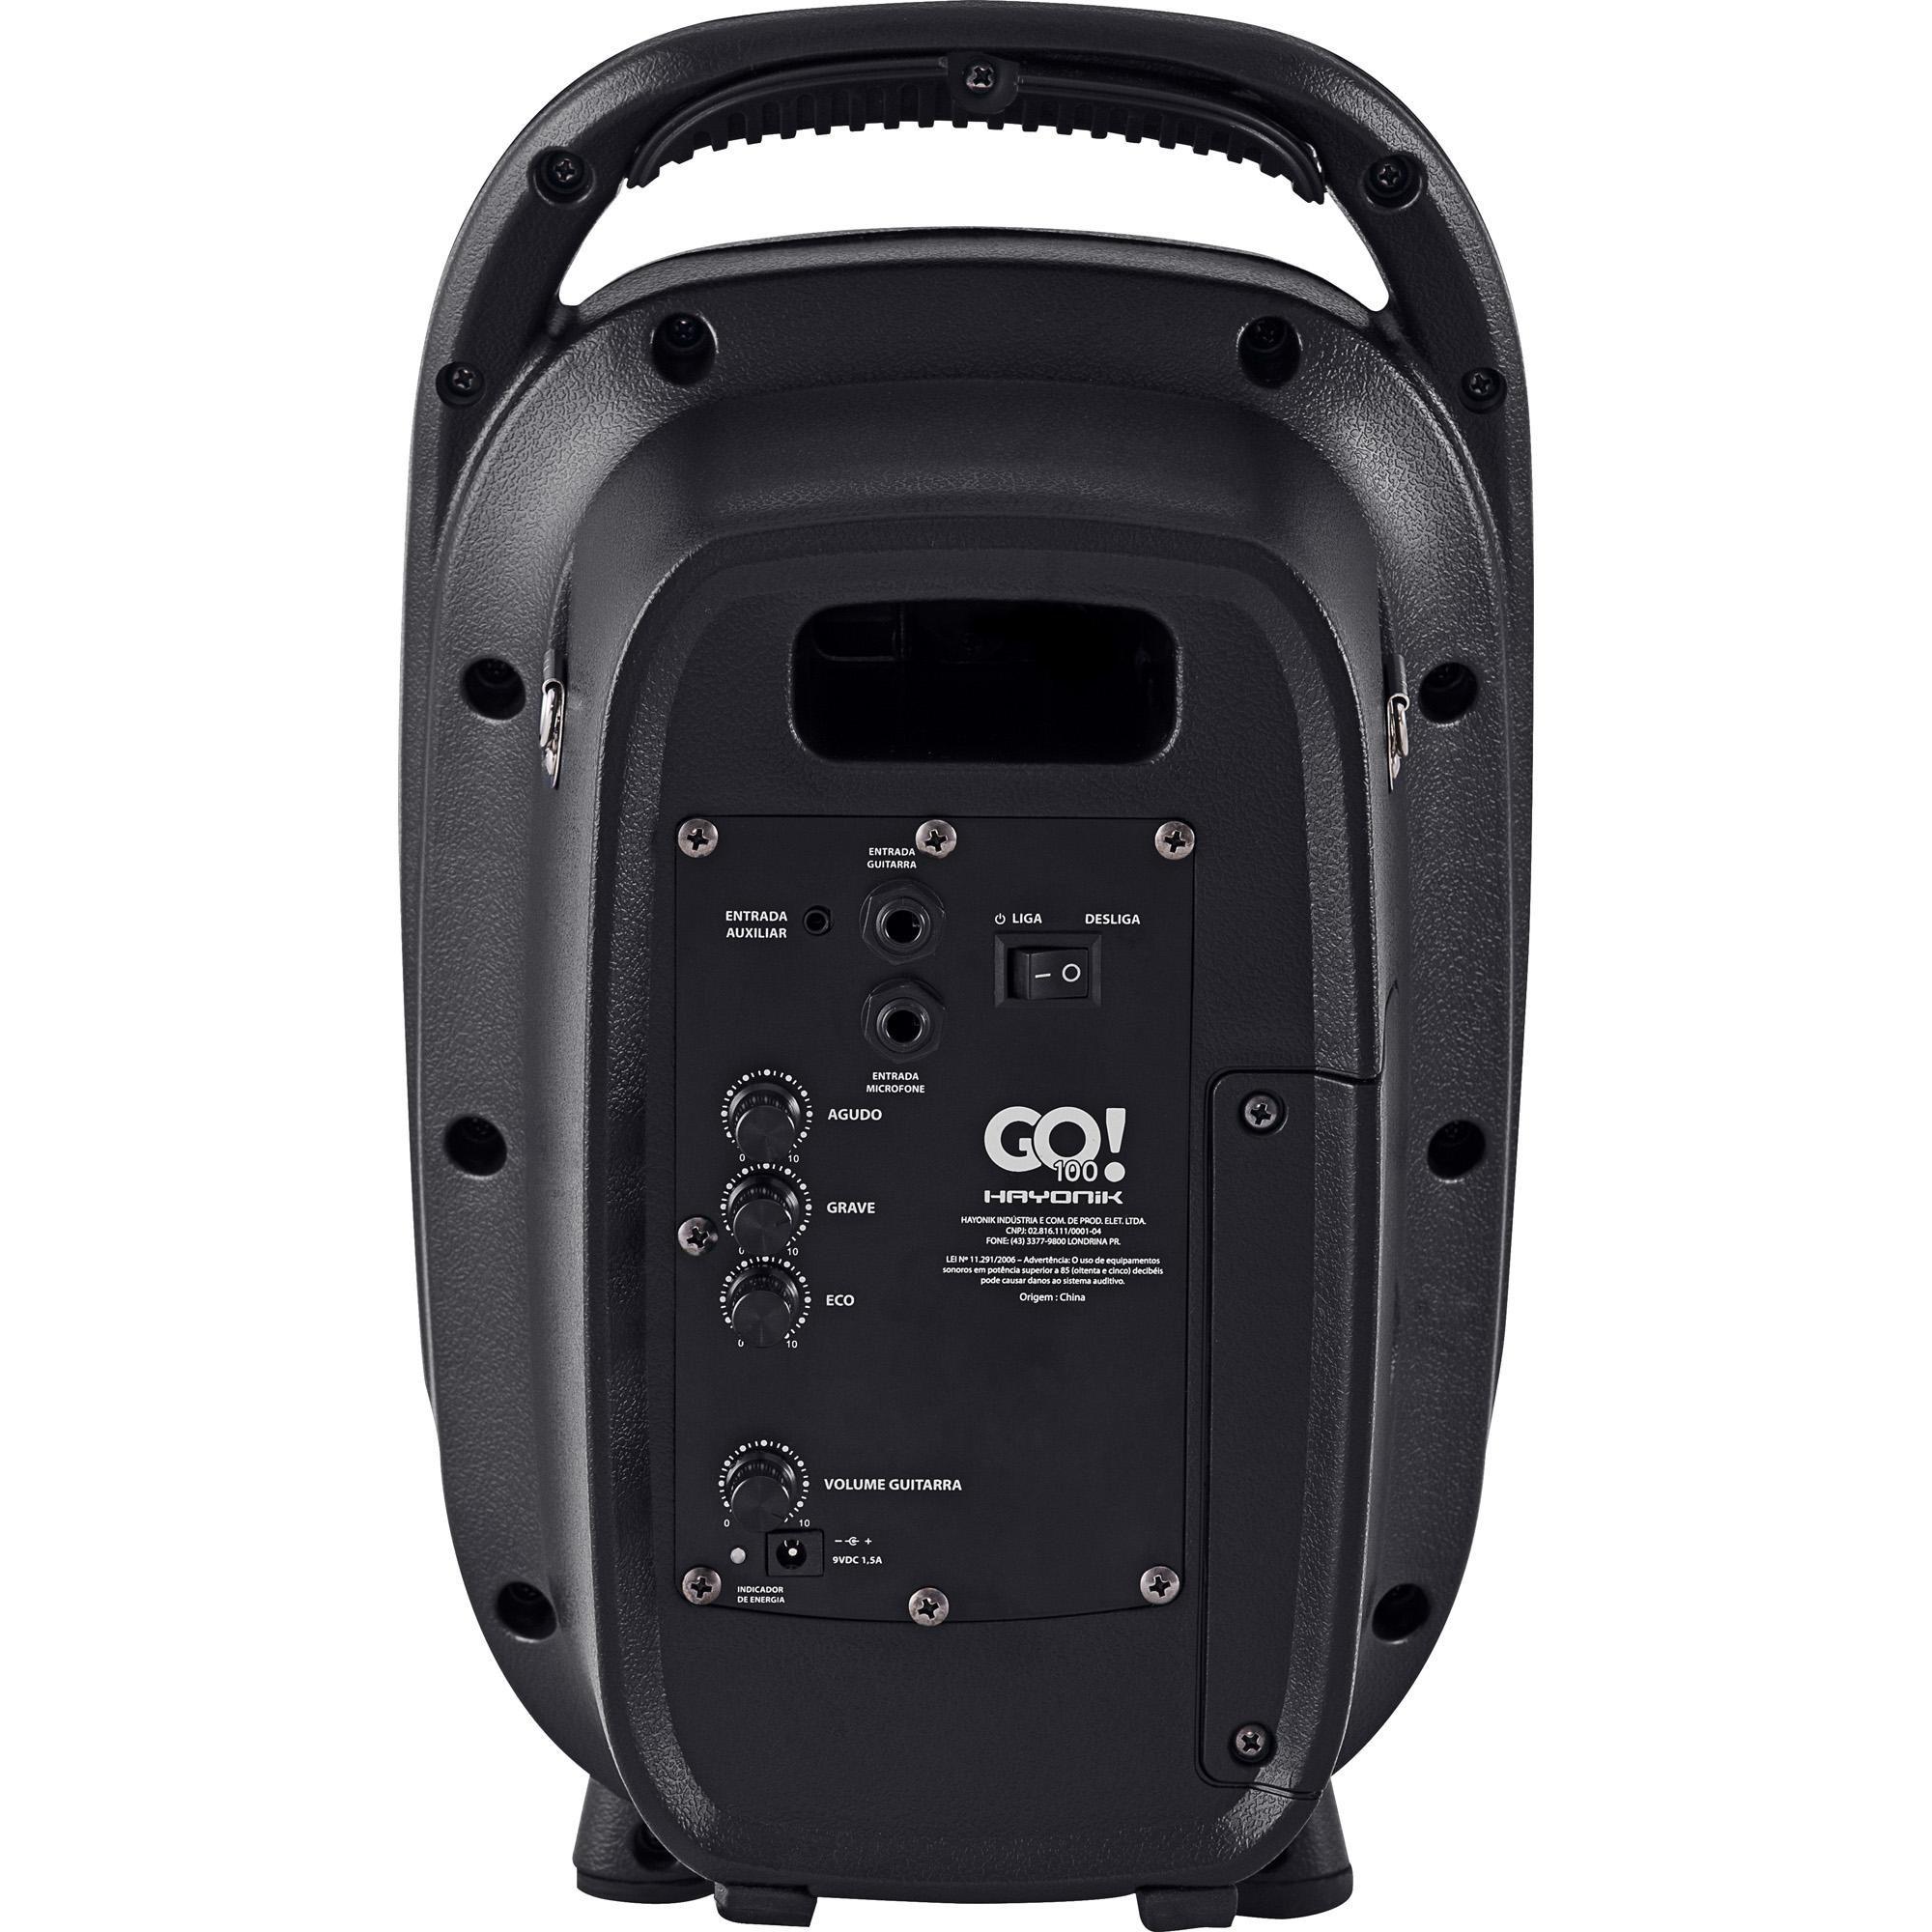 Caixa Hayonik Portatil Go100 Ativa Bateria Usb/Sd/Fm/Bt